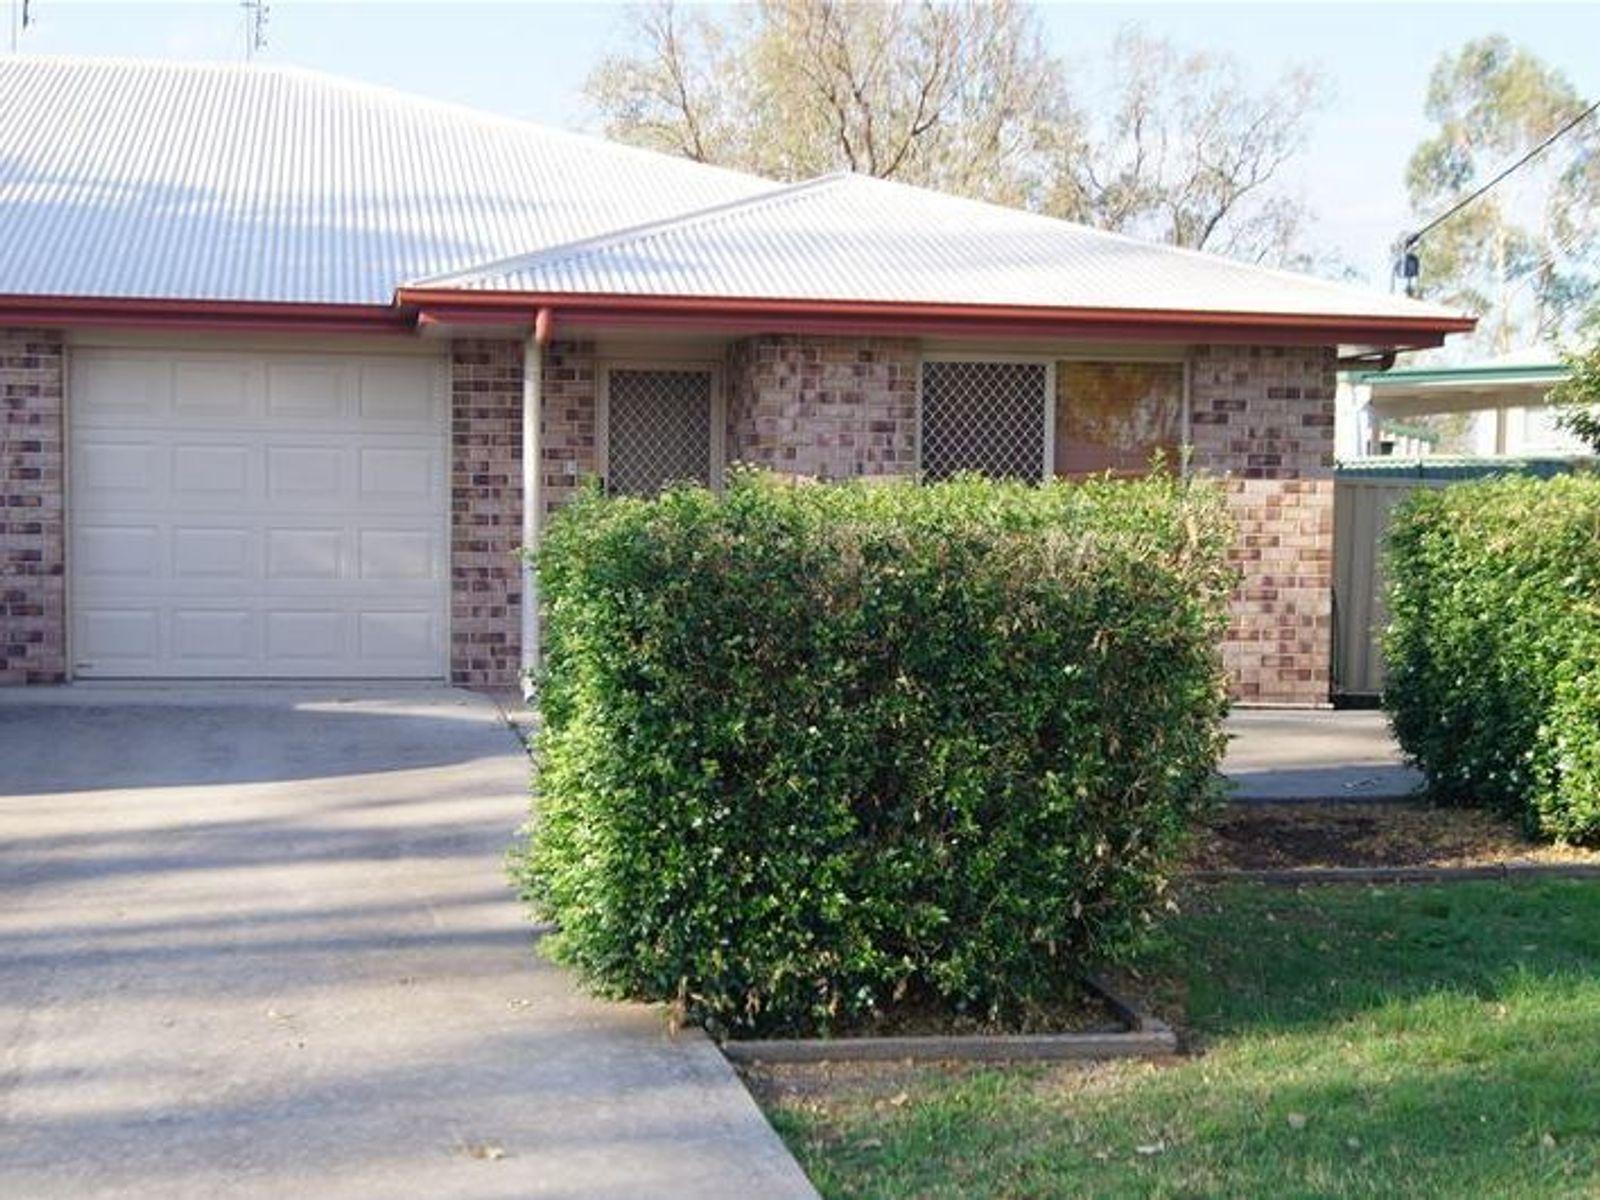 2/45 Zeller Street, Chinchilla, QLD 4413